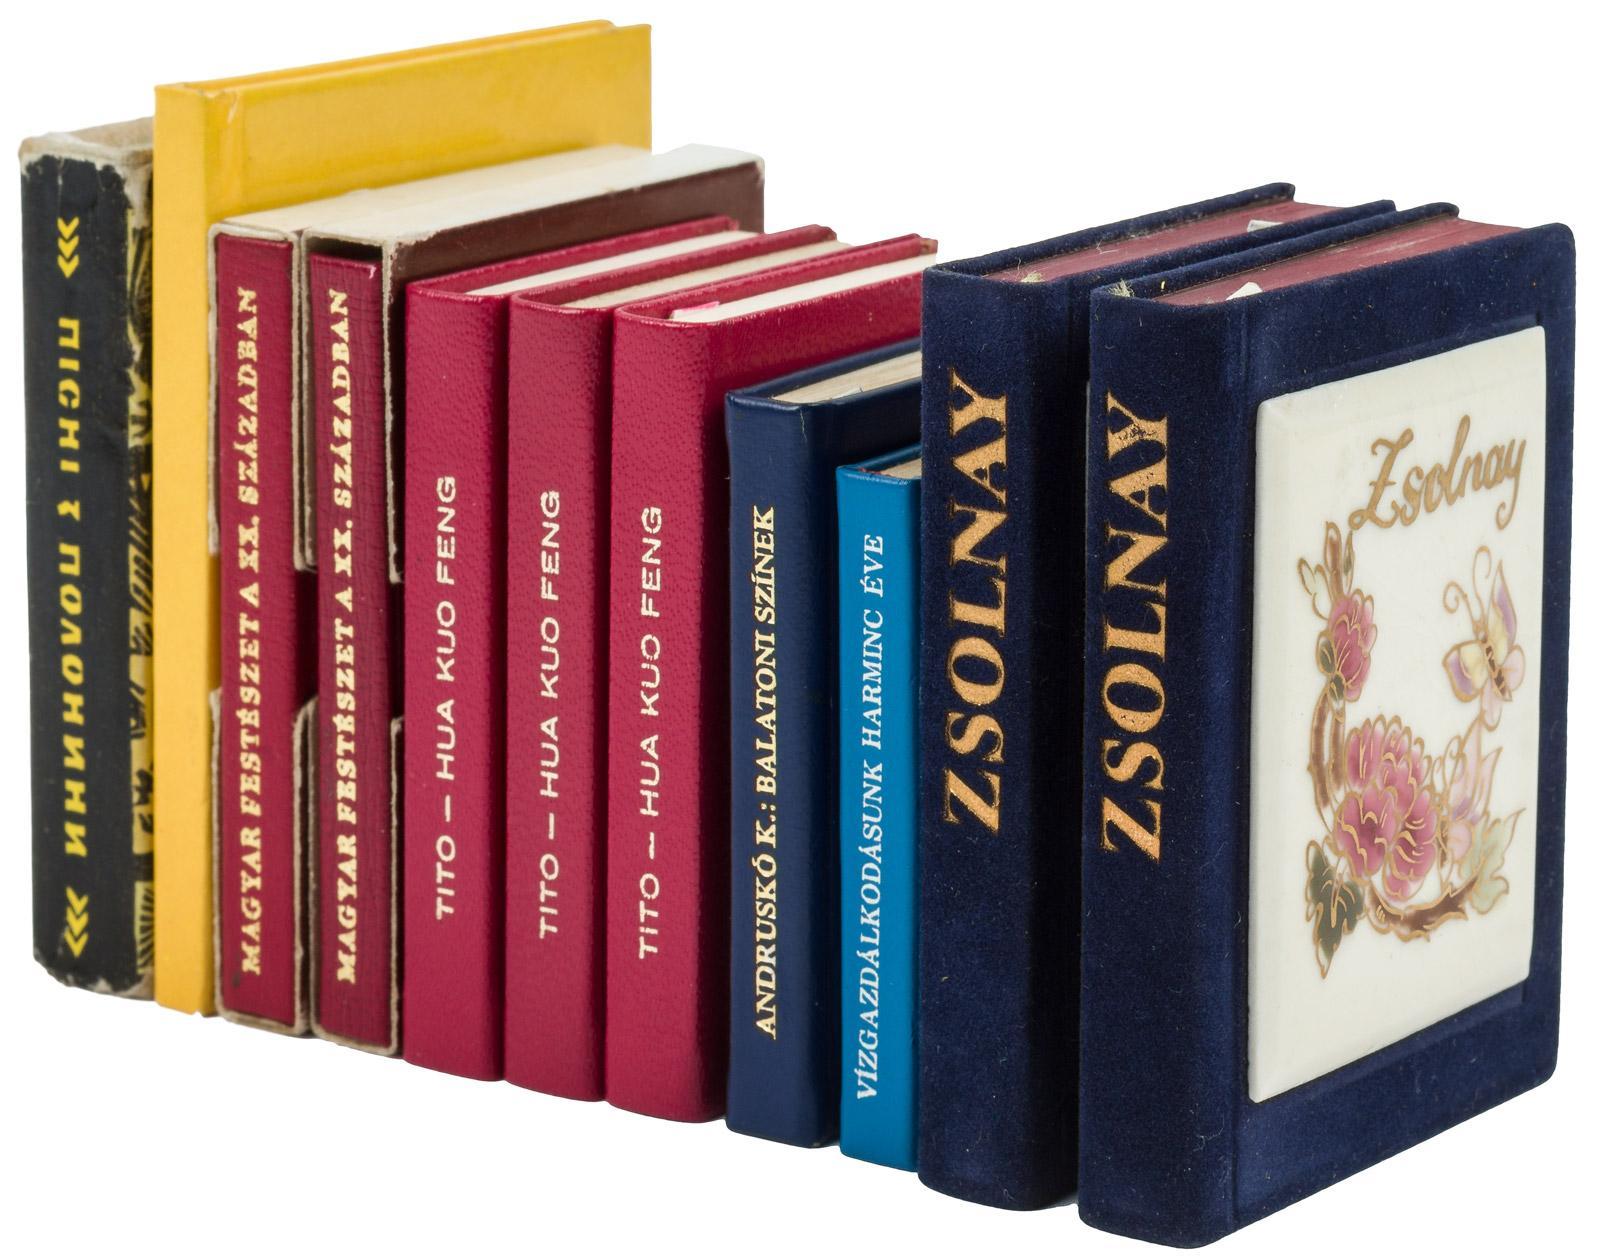 Fifty-five European miniature books - Price Estimate: $10 - $100